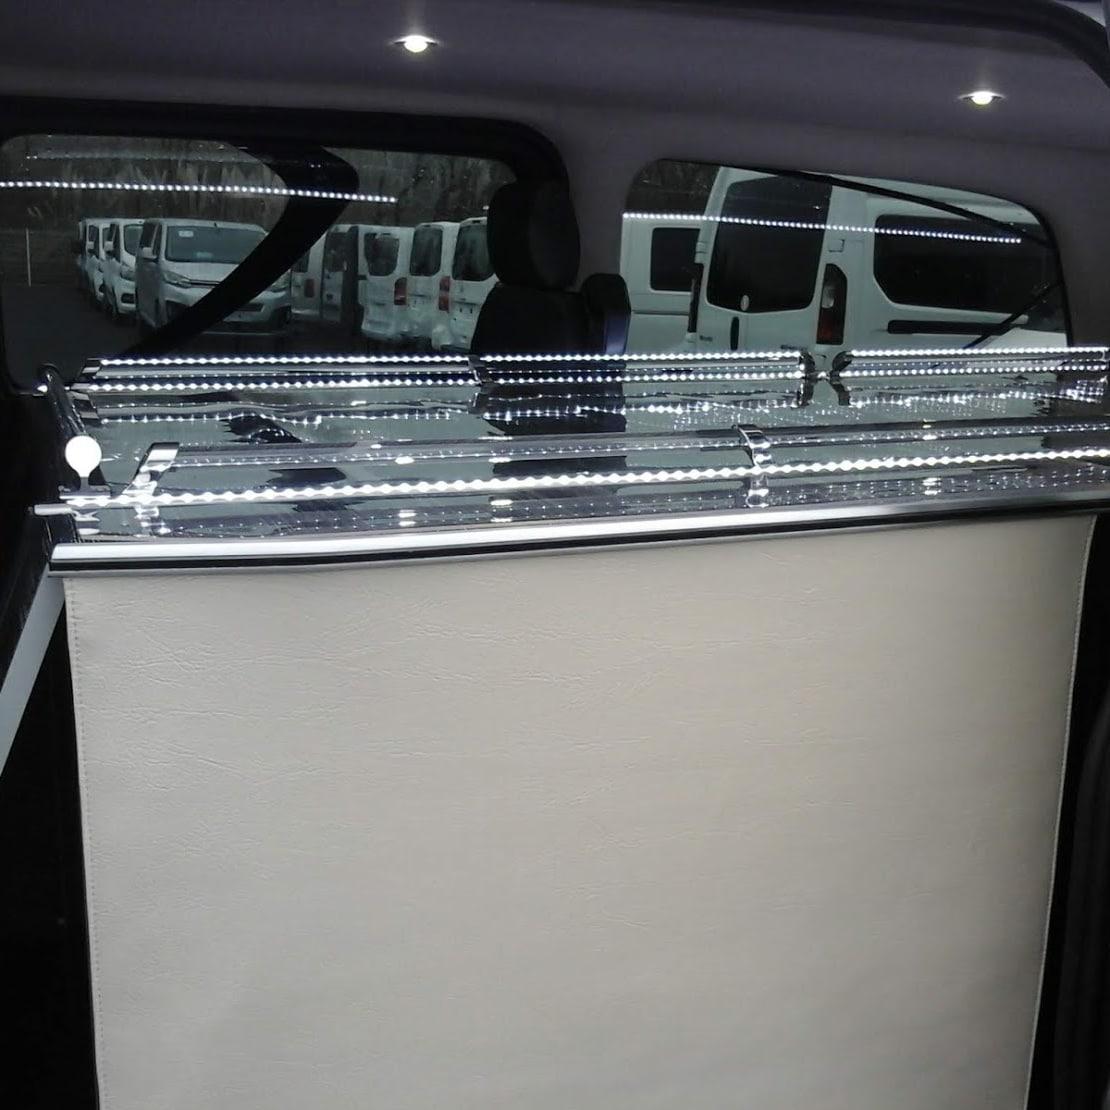 collet-funéraires-vito-7-disponible-fin-annee